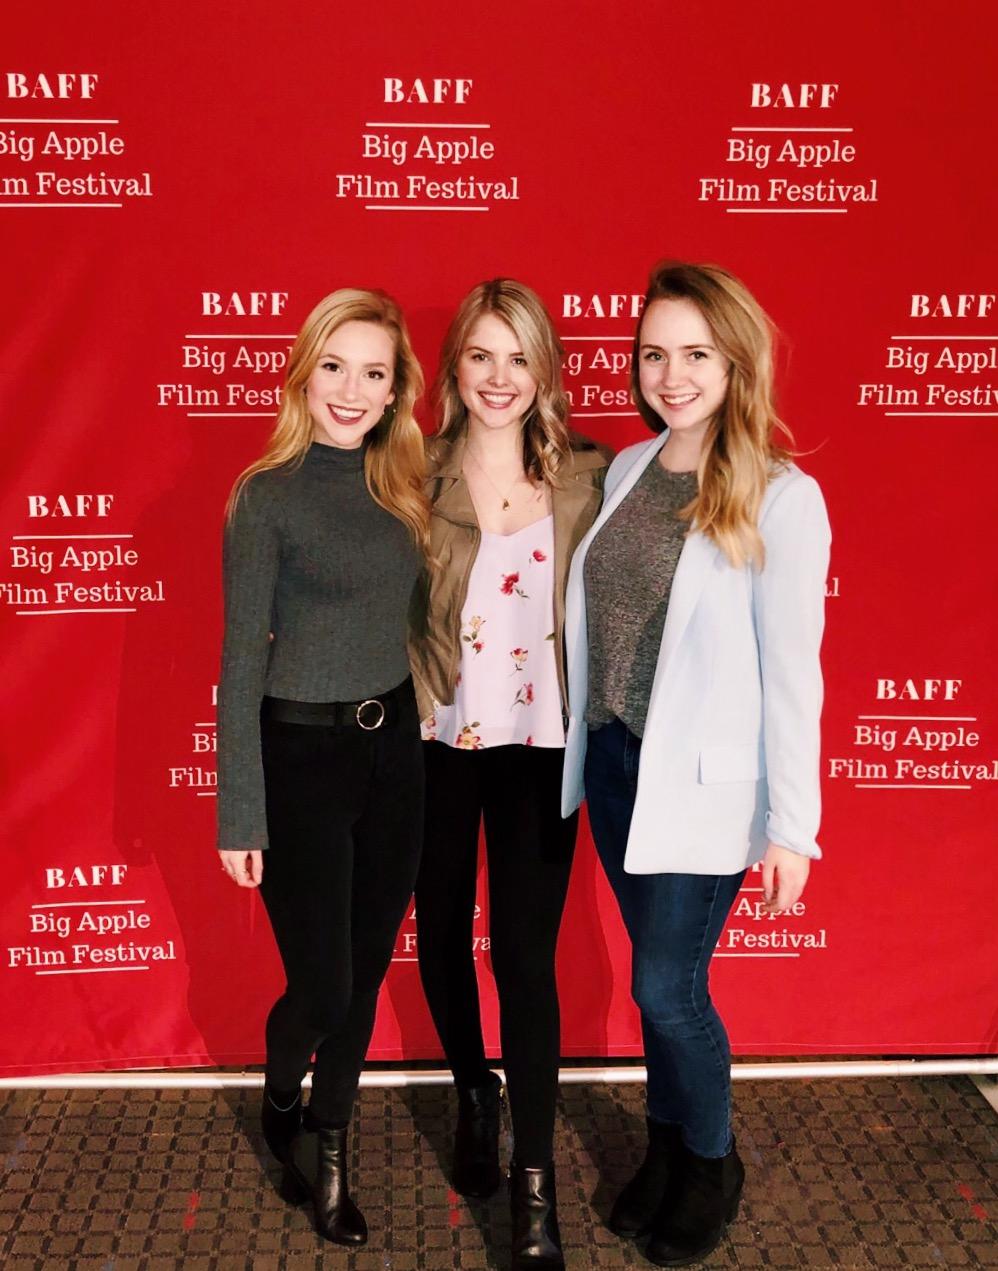 Actors Lauren DiMario, Haley Robinson, and Kaylee Barrett at the Big Apple Film Festival.